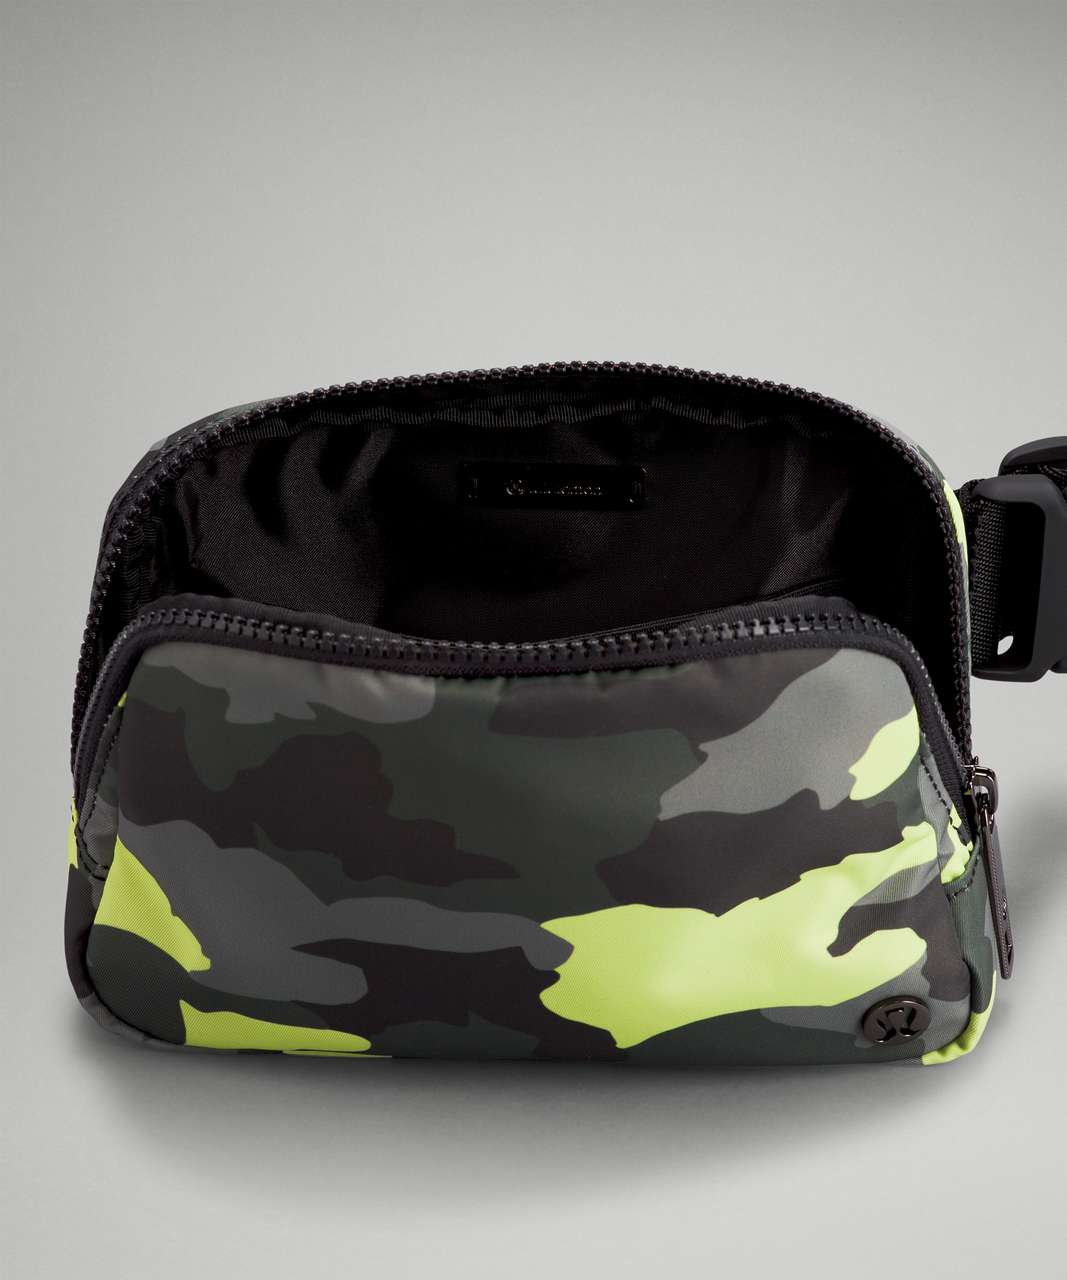 Lululemon Everywhere Belt Bag *1L - Heritage 365 Camo Neo Mint Multi / Black